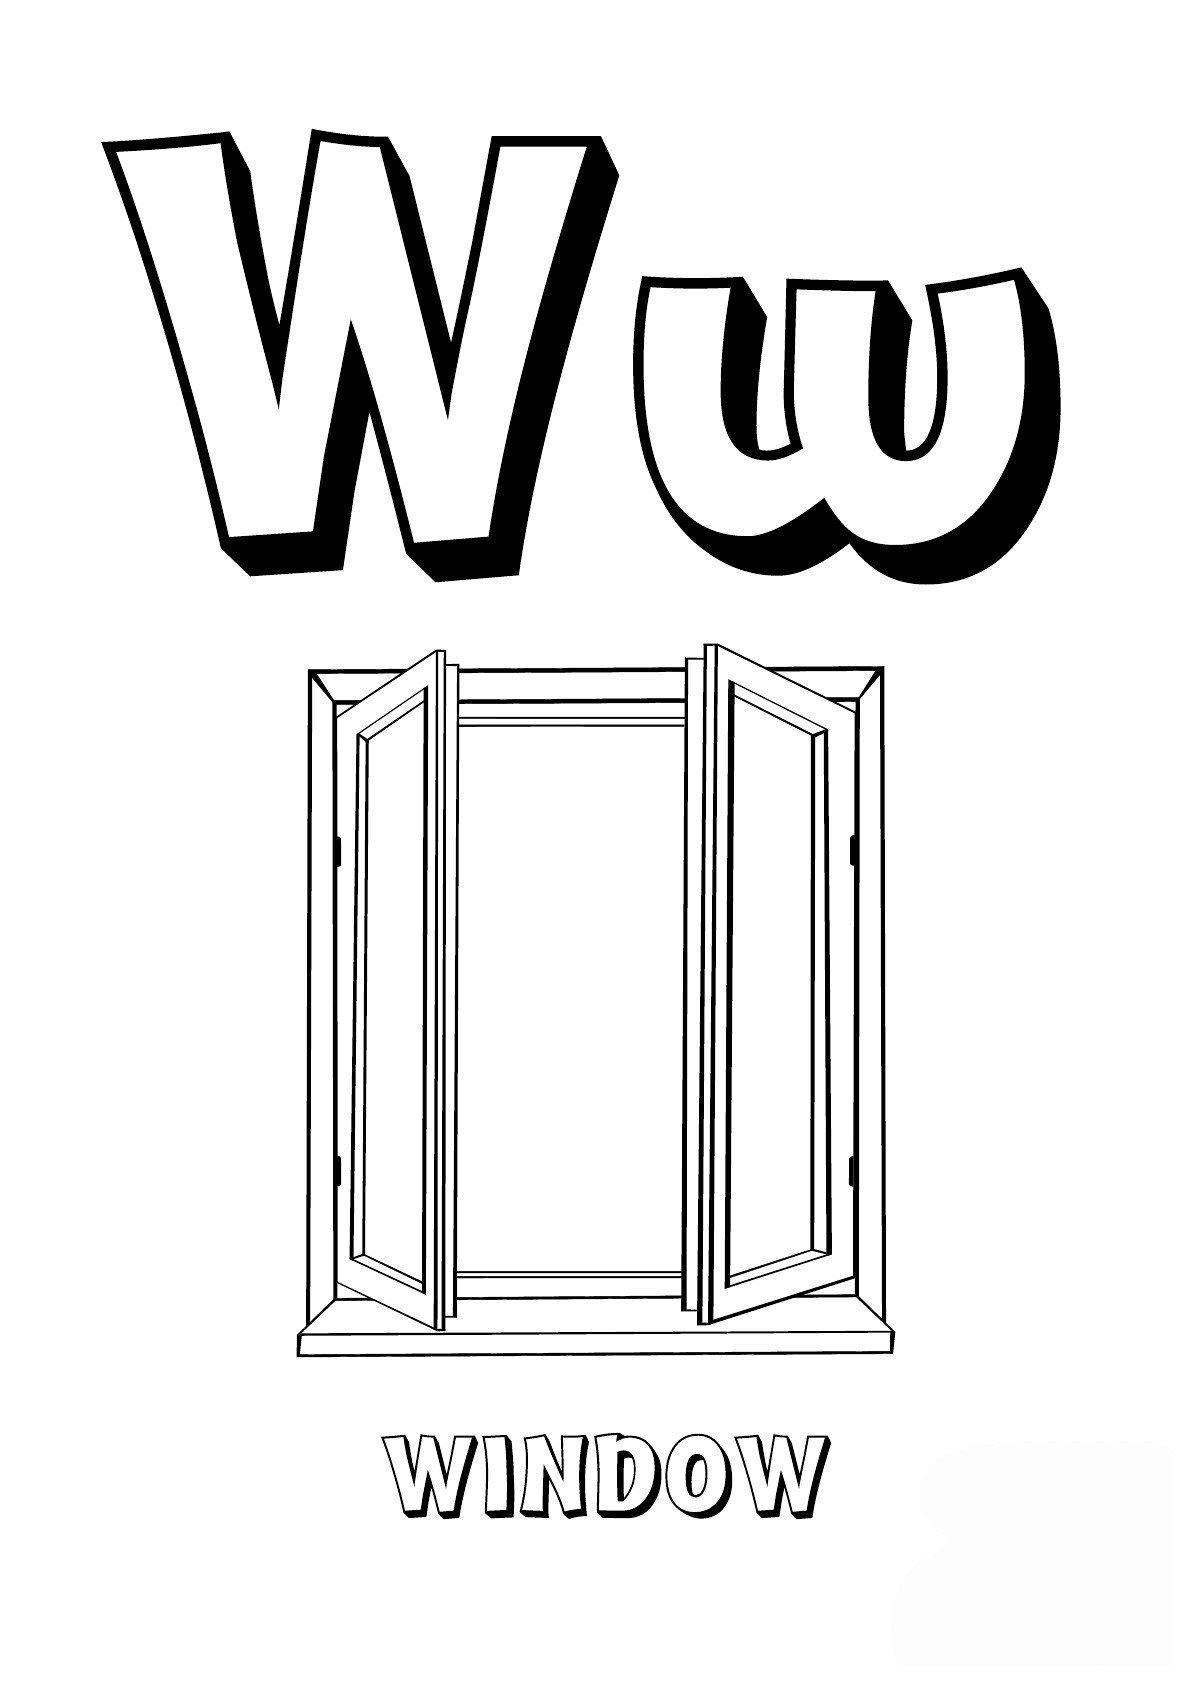 Буква W английского алфавита - Картинка для раскрашивания красками-гуашью